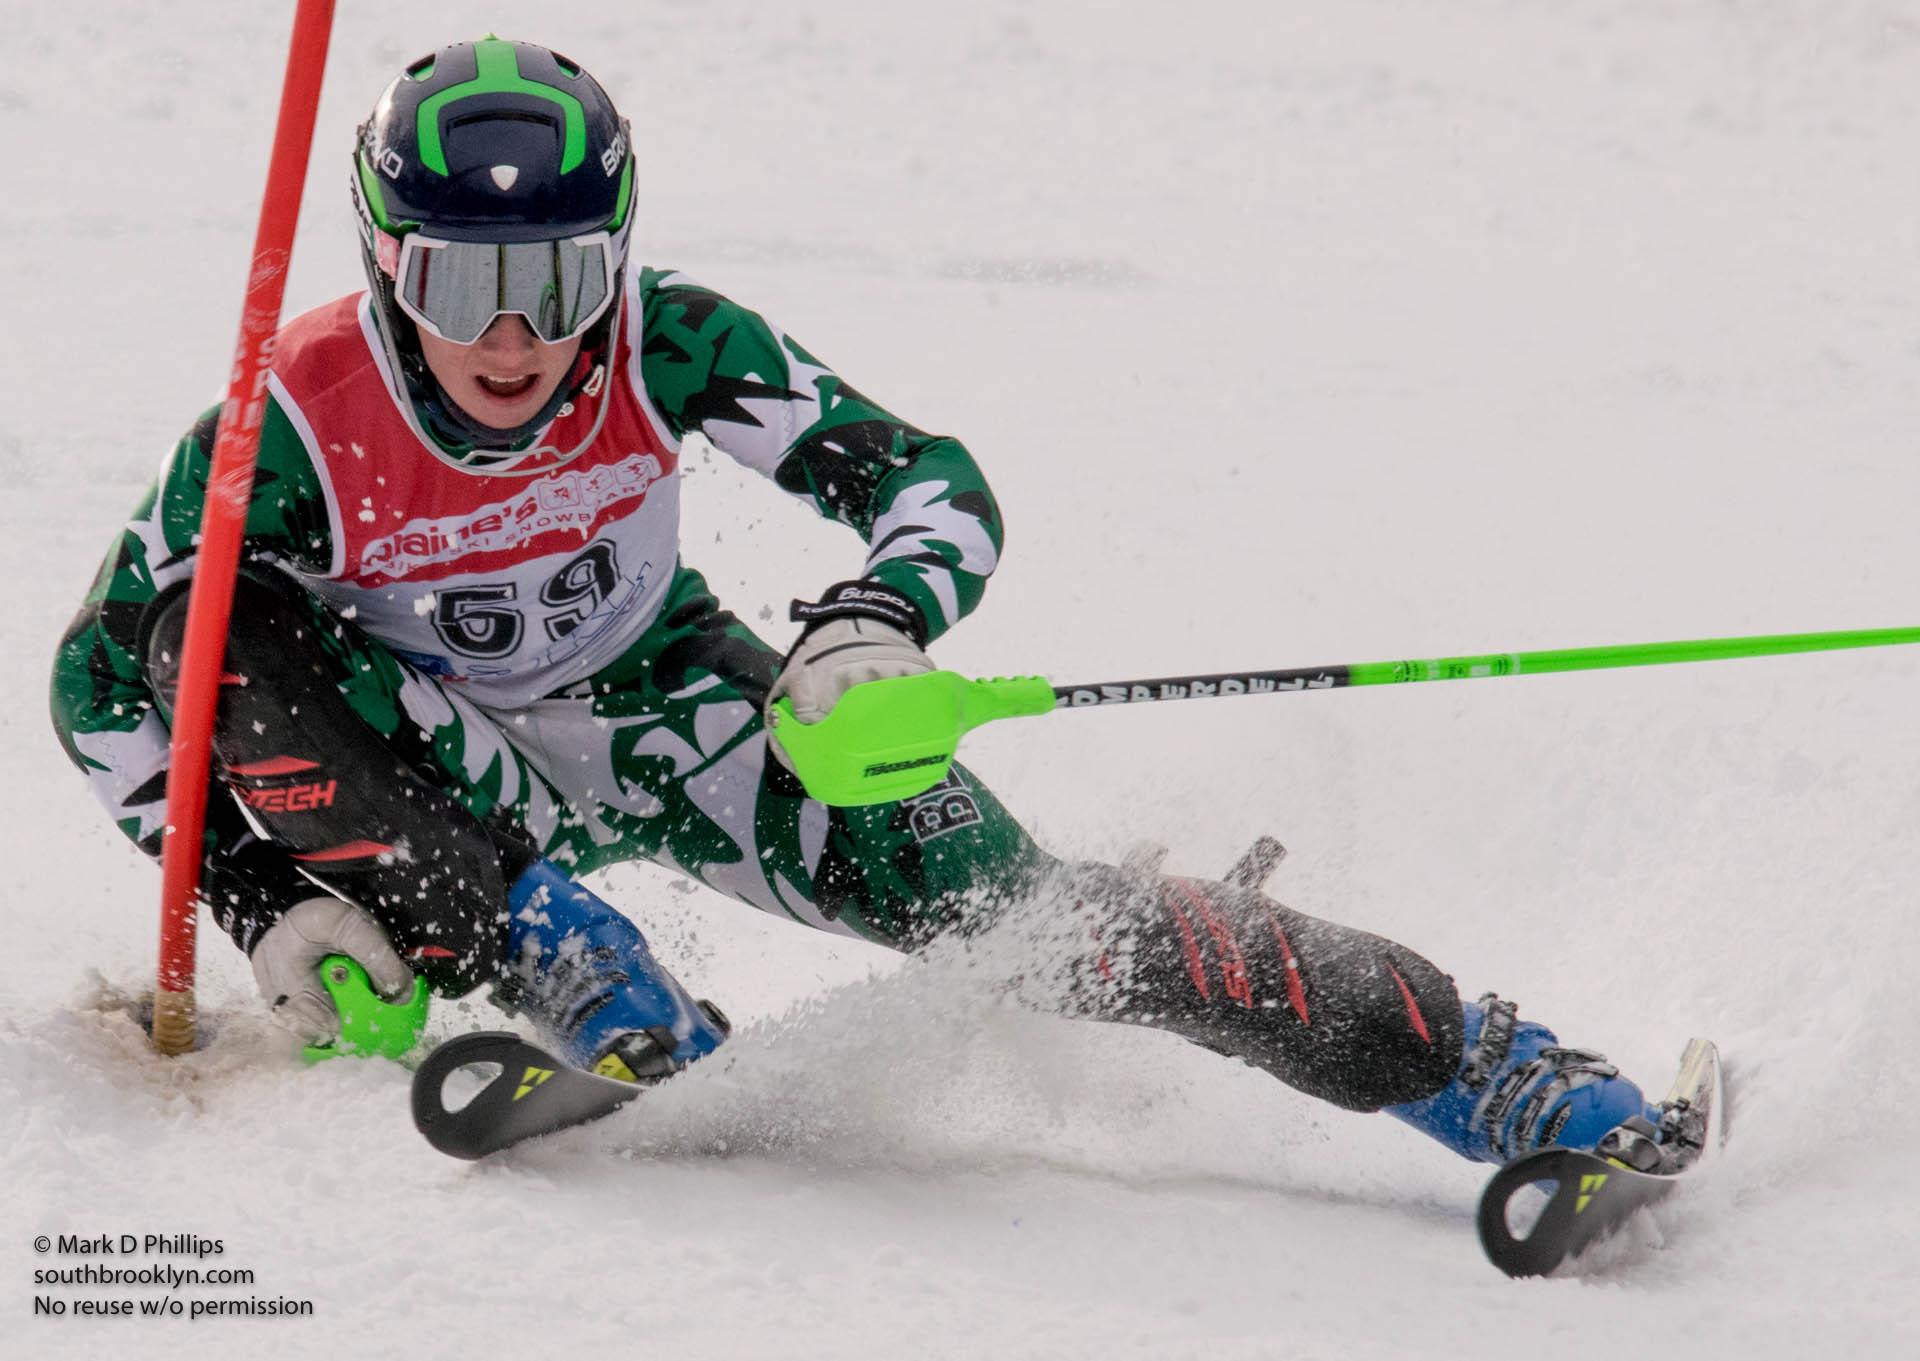 LyonsBrown_skiing_crMarkDPhillips